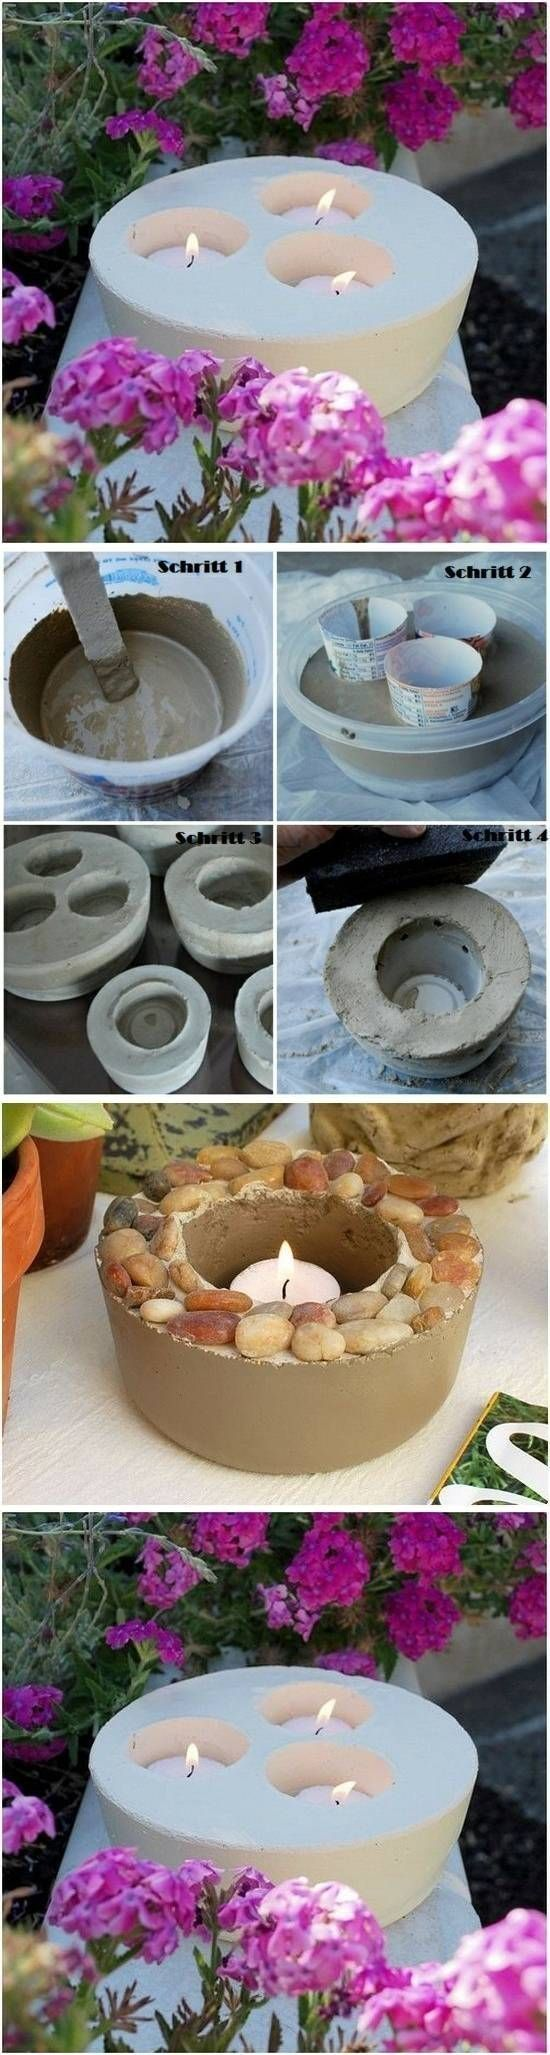 DIY Concrete Candlestick #Candlesticks by Maria CS